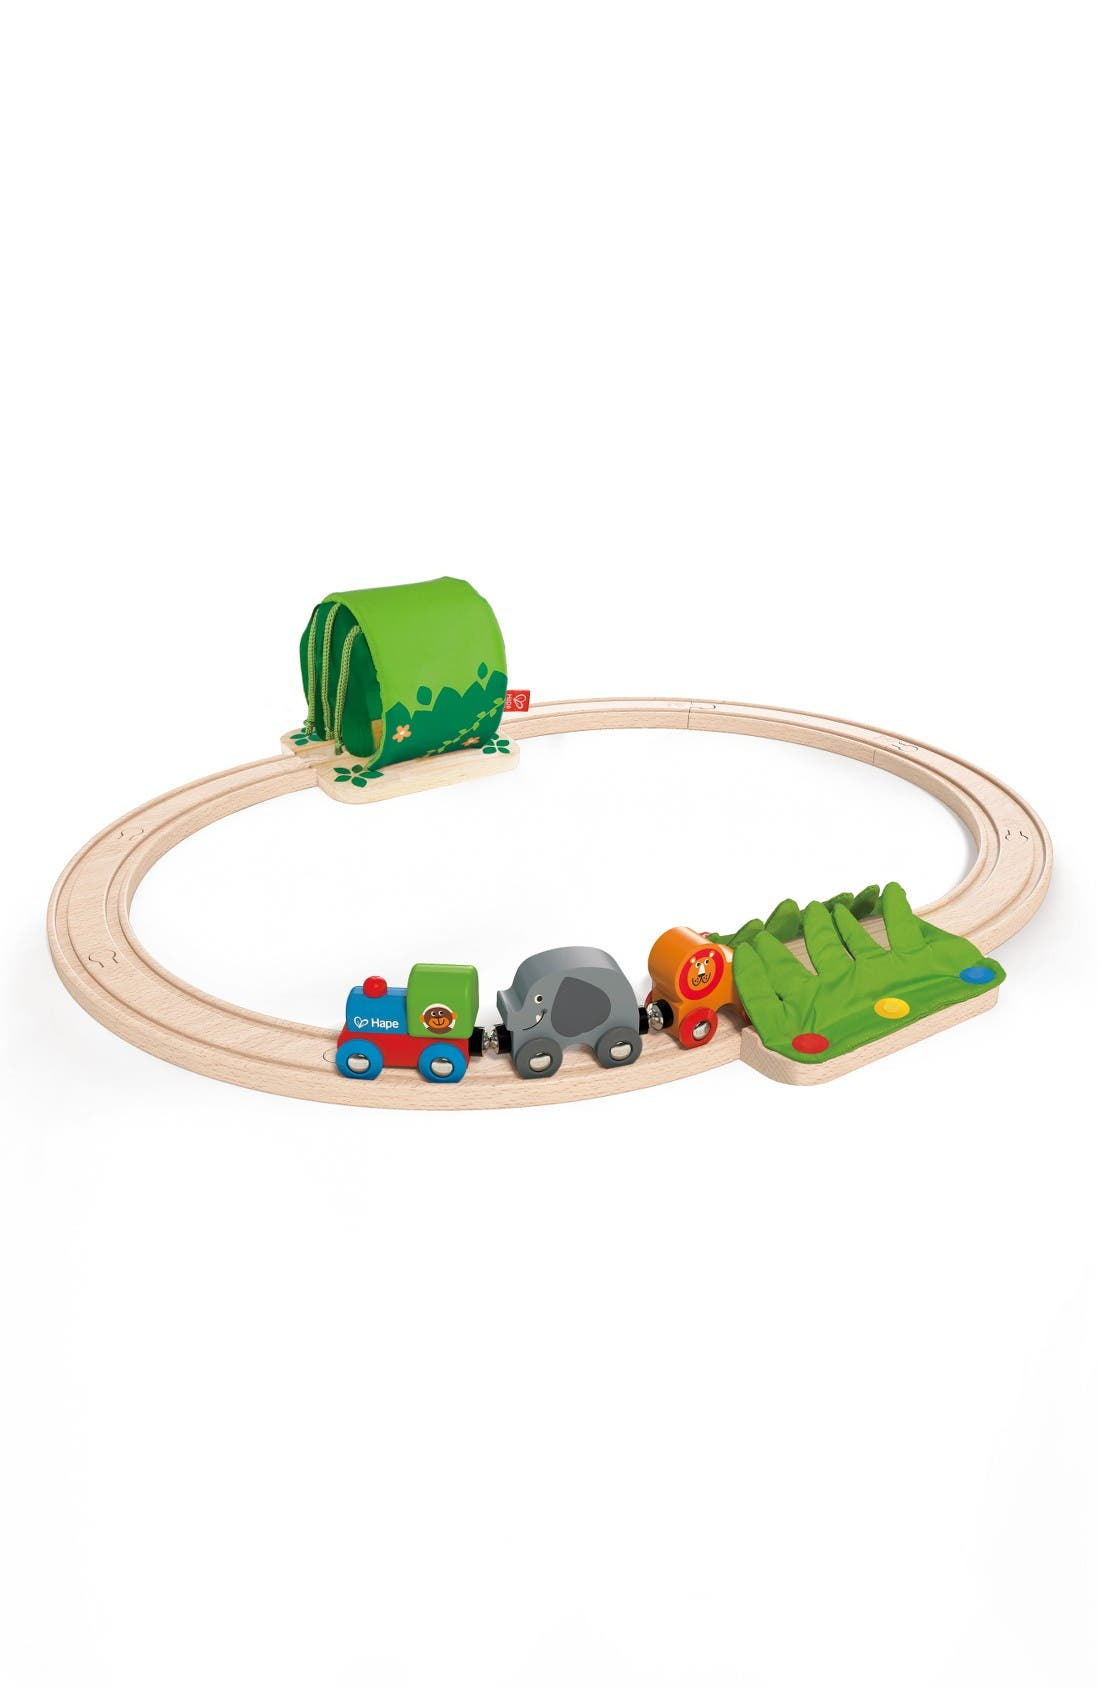 Jungle Train Journey Wooden Train Set,                             Main thumbnail 1, color,                             Multi